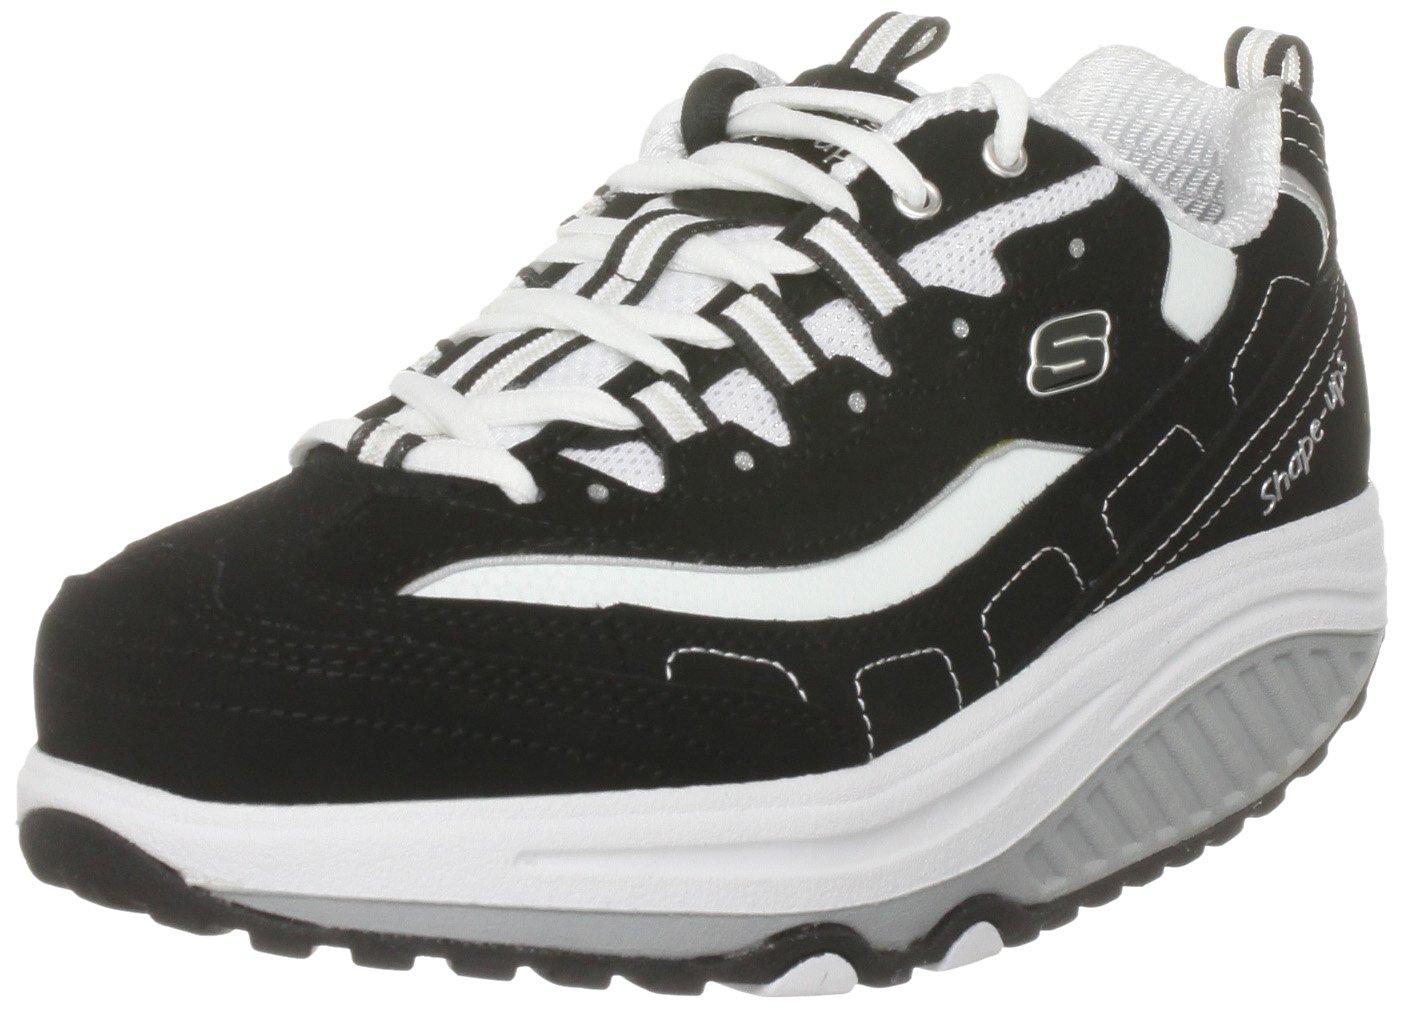 Skechers Women's Shape Ups Strength Fitness Walking Shoe,Black/White,9 M US